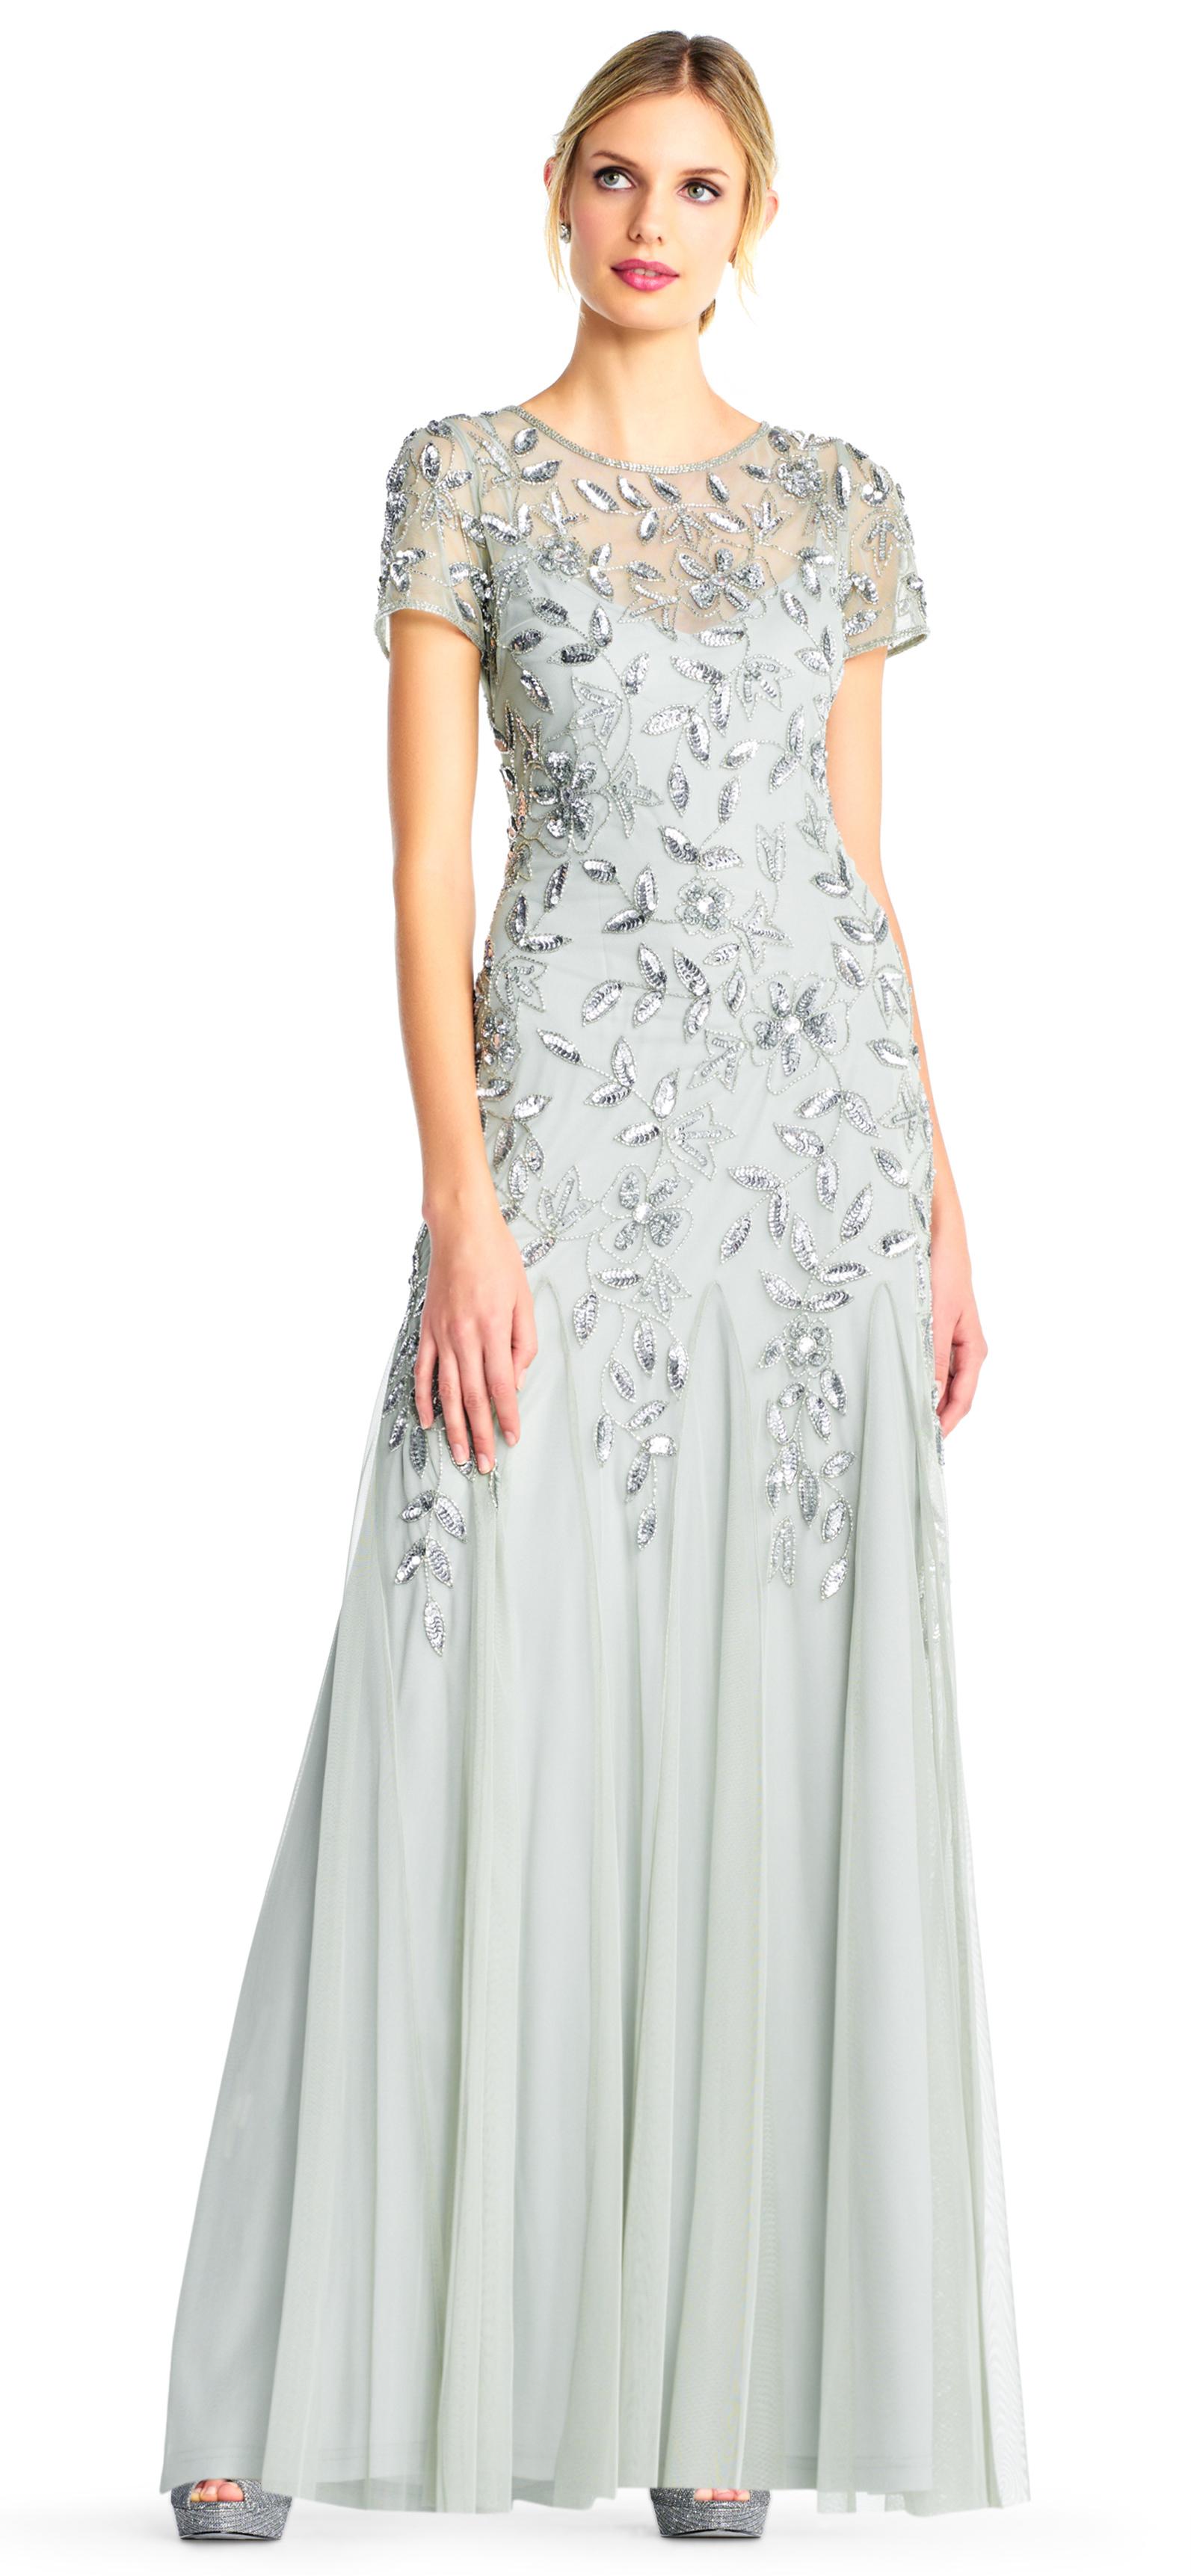 plus size short wedding dresses photo - 1